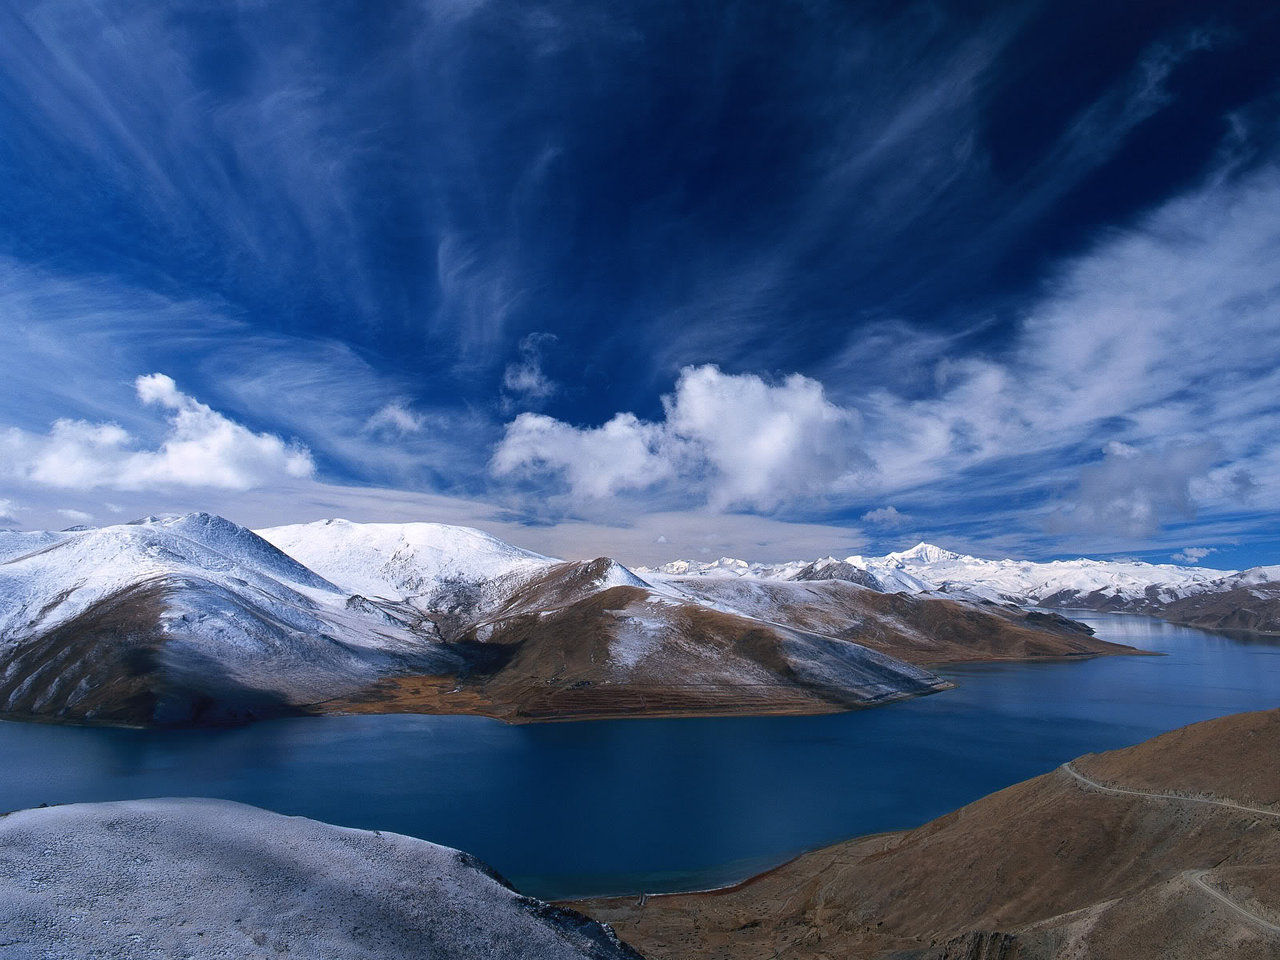 World_China_Chinese_mountains_00754.jpg